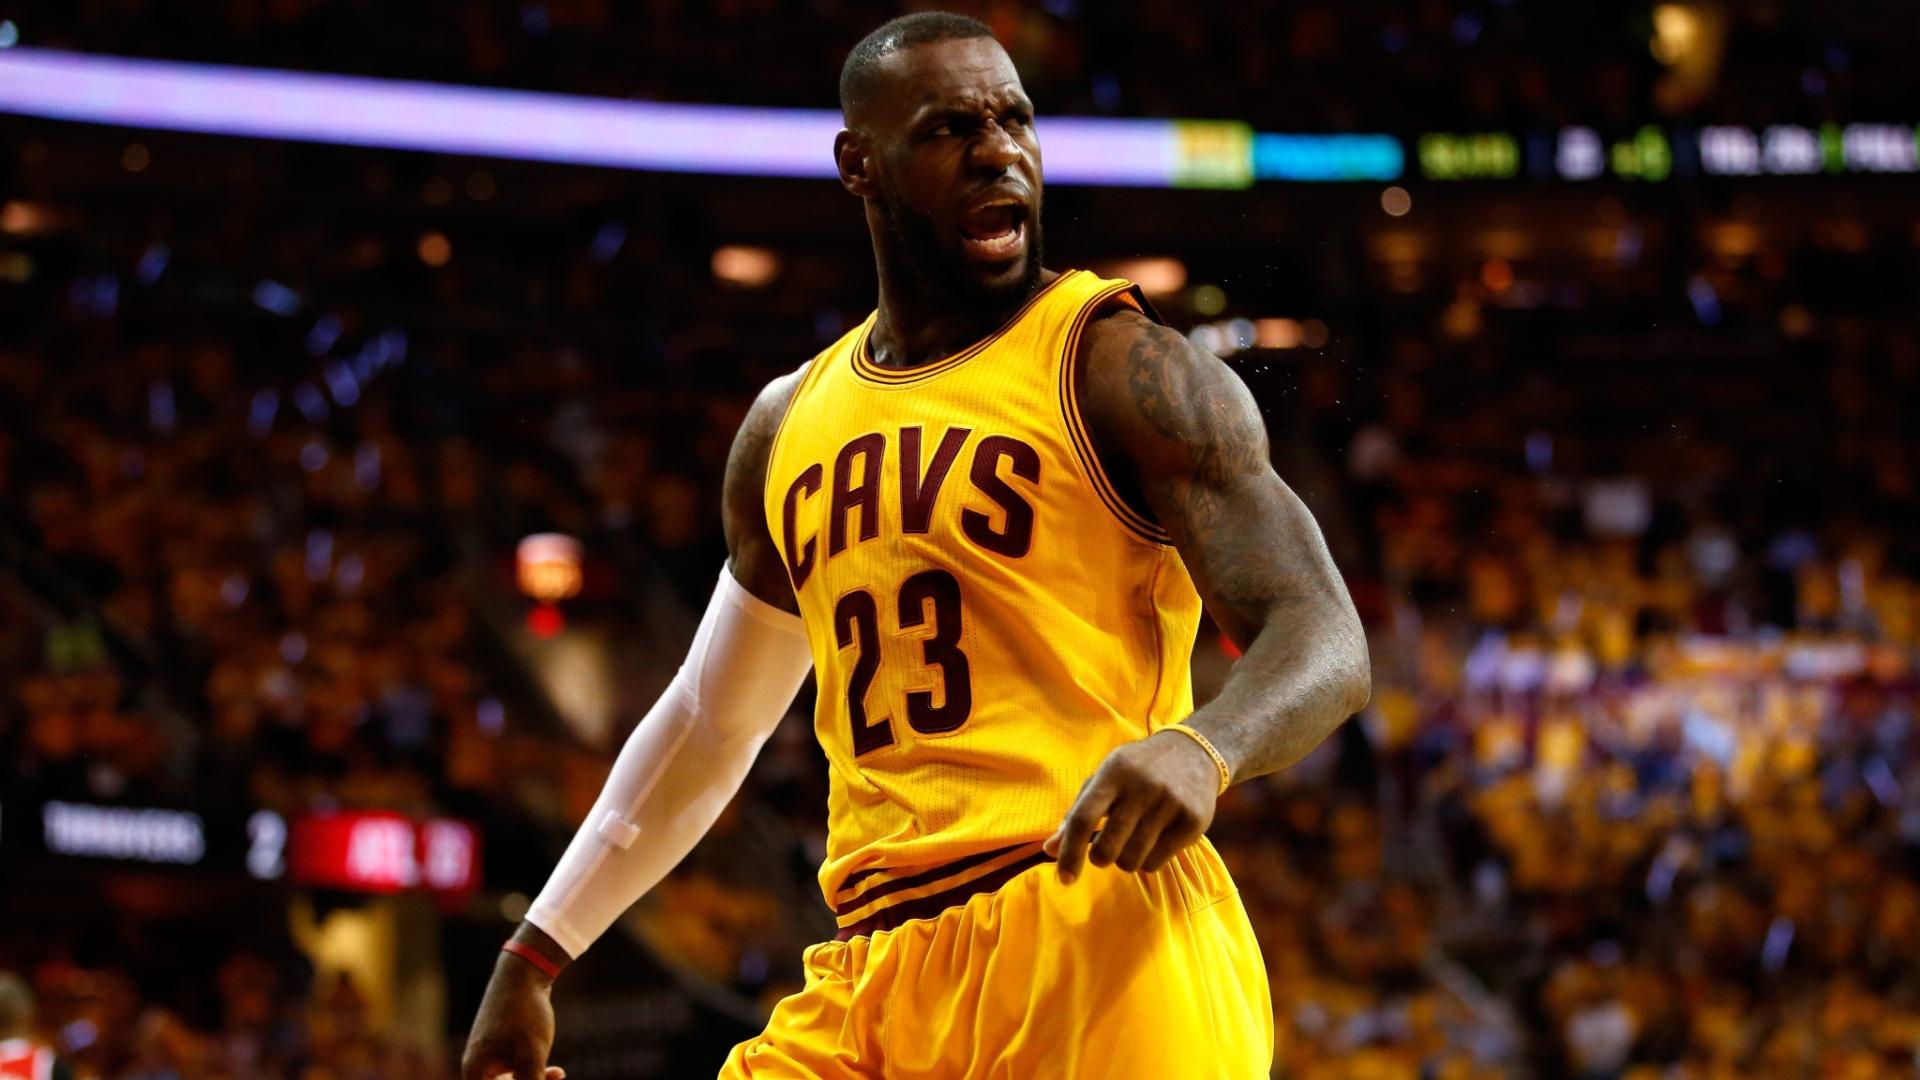 LeBron James comemora durante partida do Cleveland Cavaliers